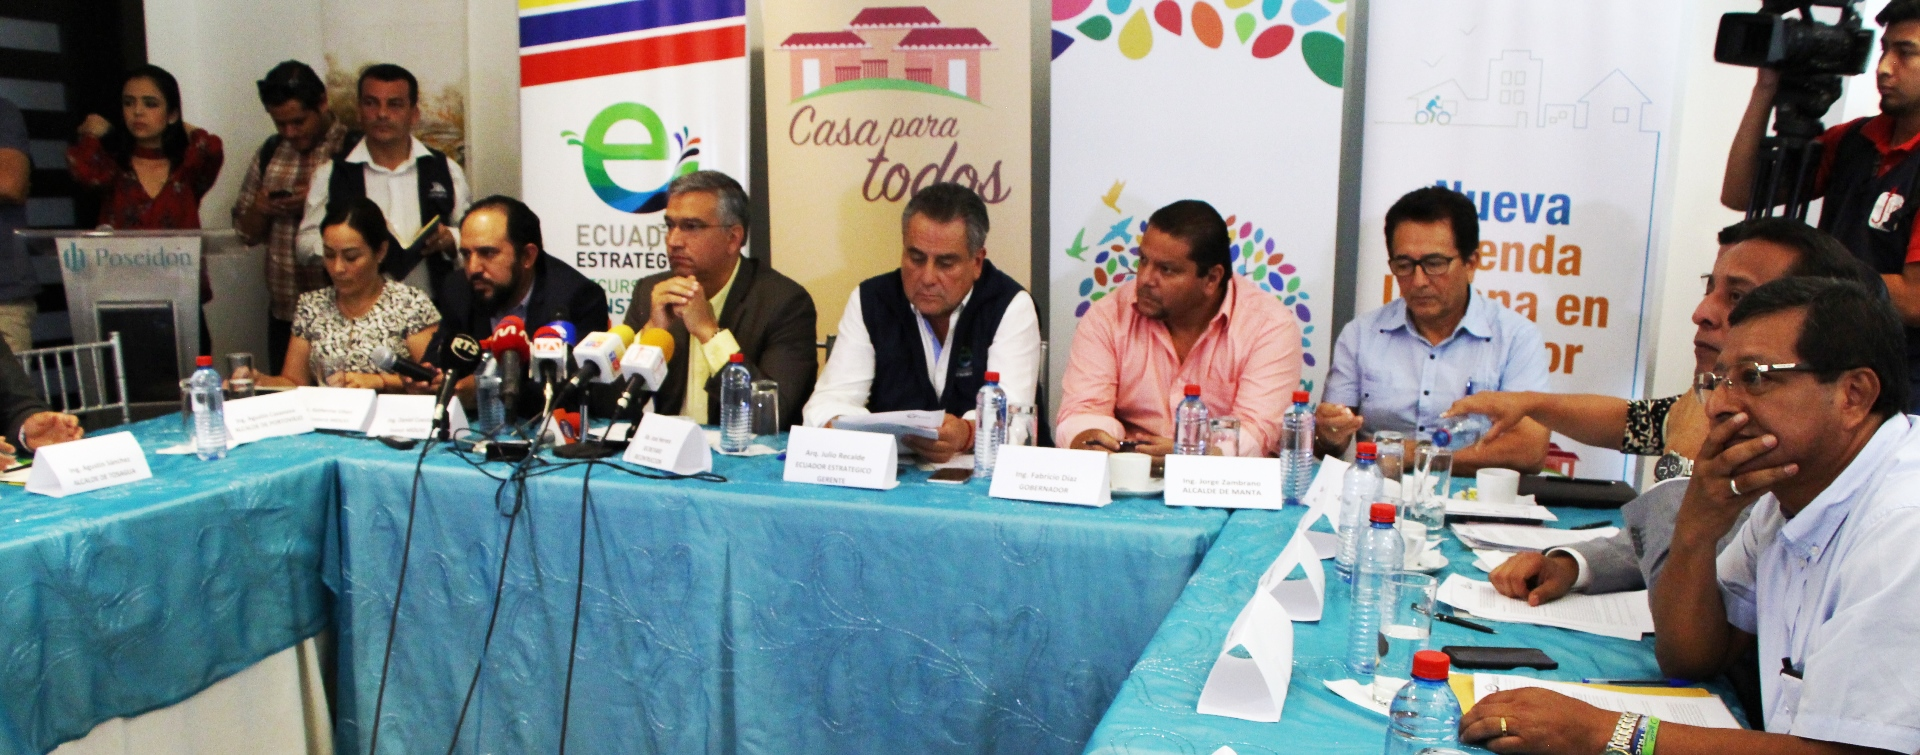 Casa para todos: municipios de Manabí comprometen espacios habilitados